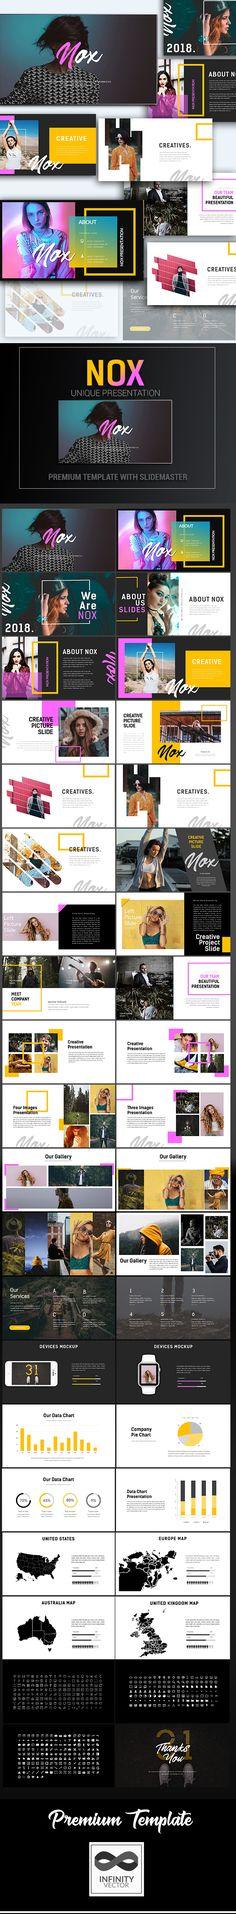 Nox Creative Presentation Google Slide - #Google #Slides #Presentation Templates